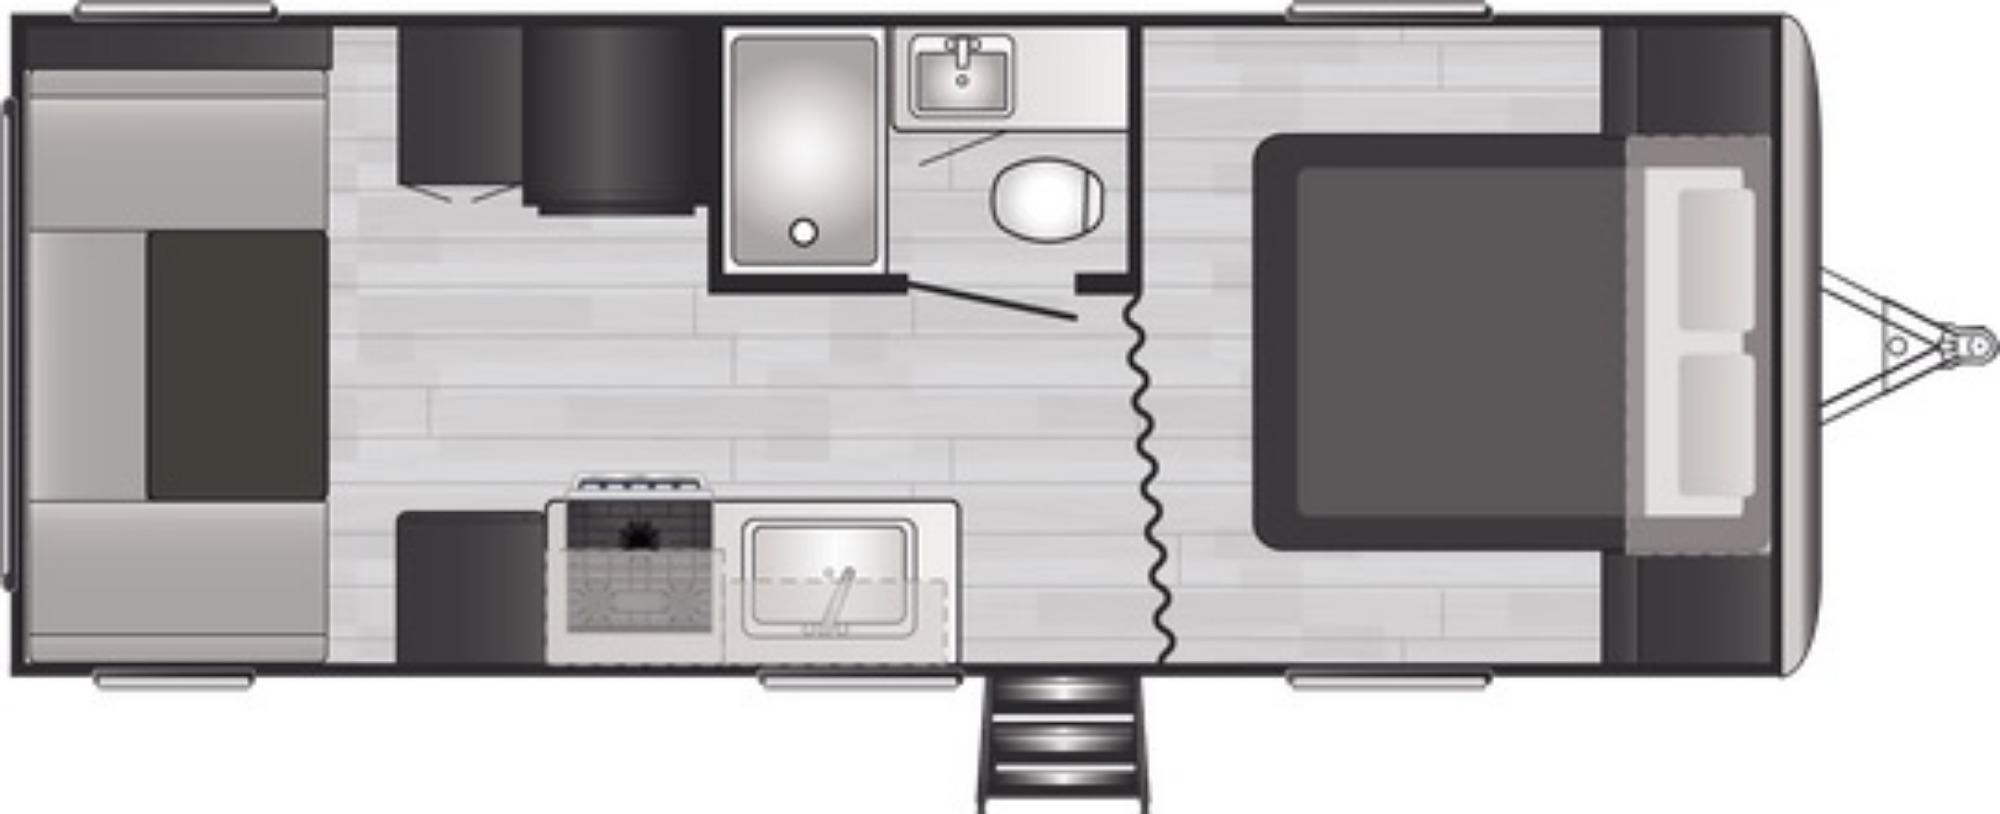 View Floor Plan for 2021 KEYSTONE SPRINGDALE 202QBWE